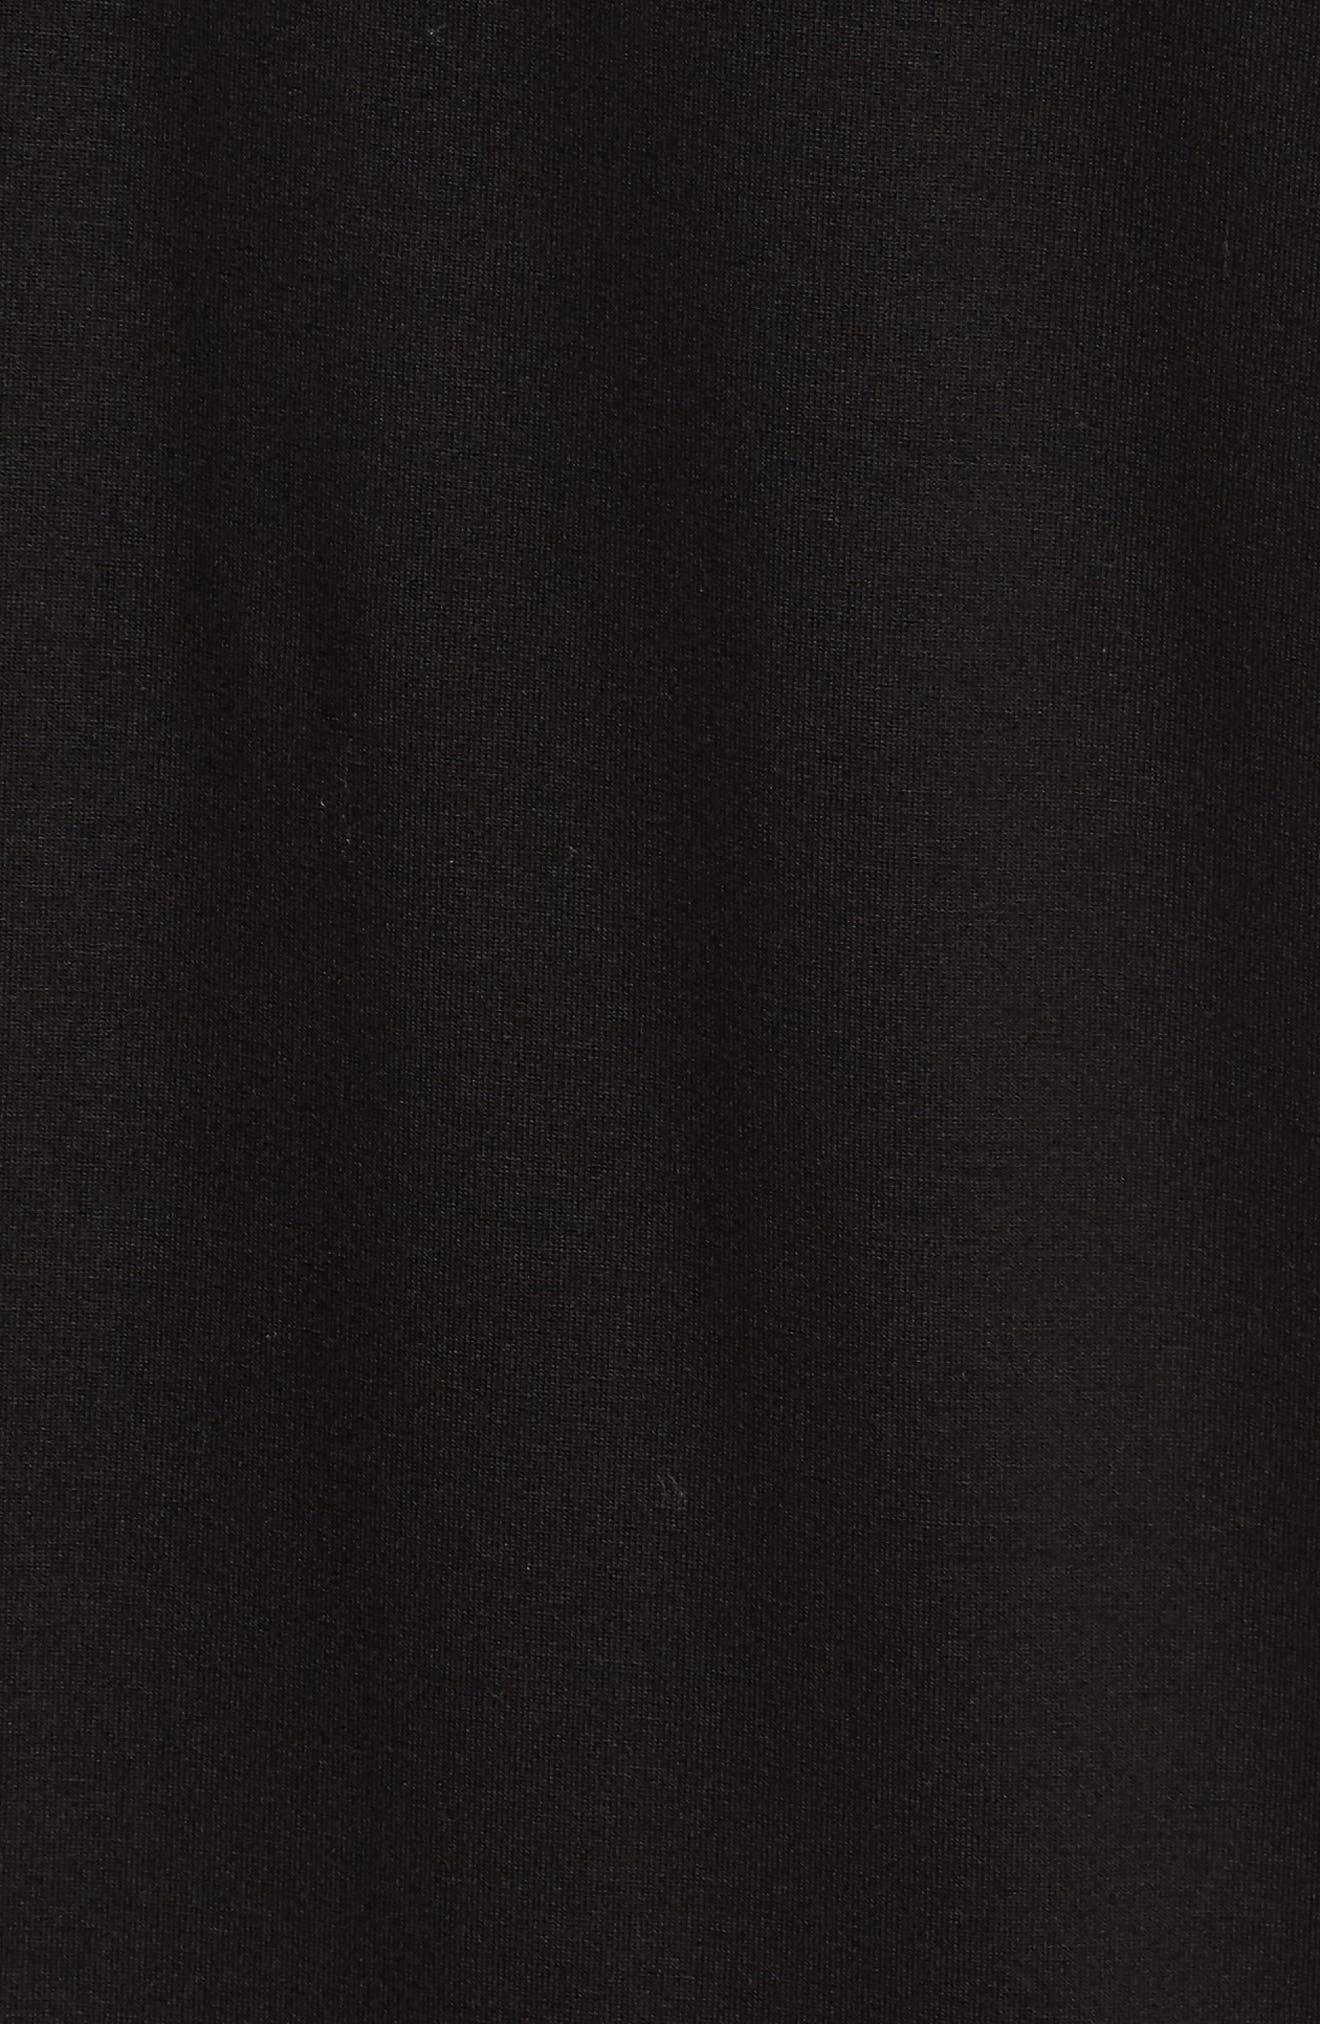 V-Back Stretch Tencel<sup>®</sup> Lyocell Shift Dress,                             Alternate thumbnail 6, color,                             001